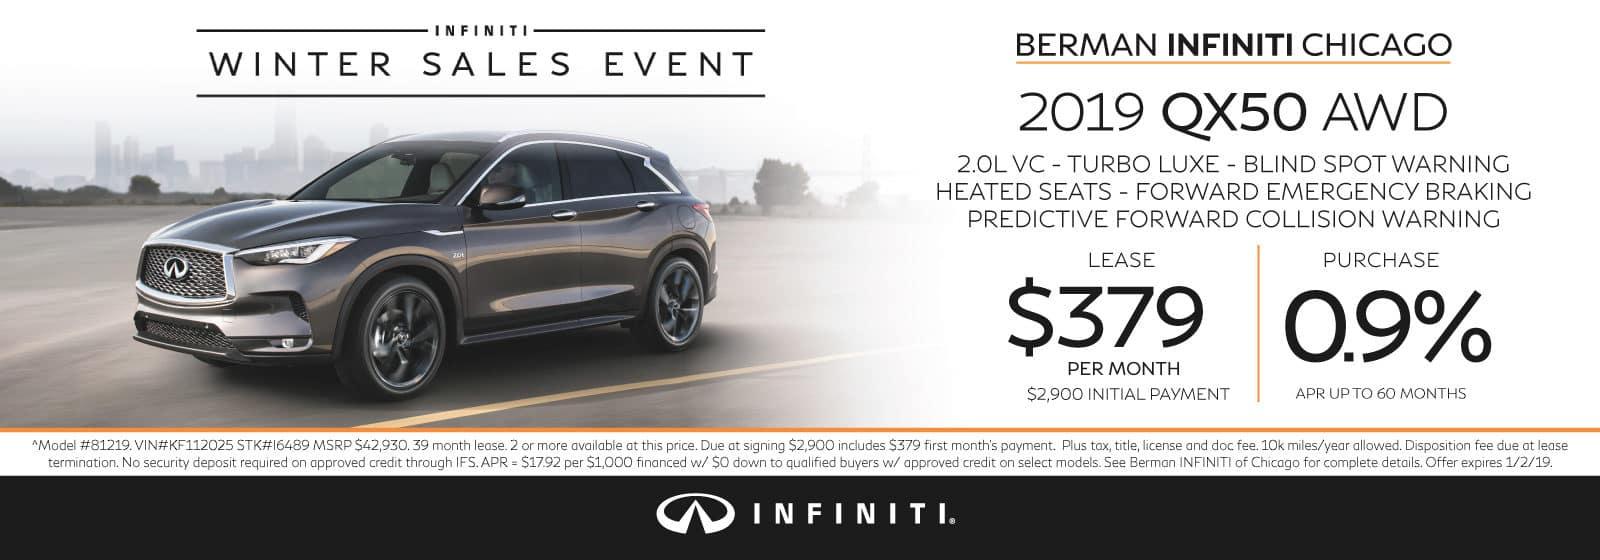 New 2019 INFINITI QX50 December offer at Berman INFINITI Chicago!